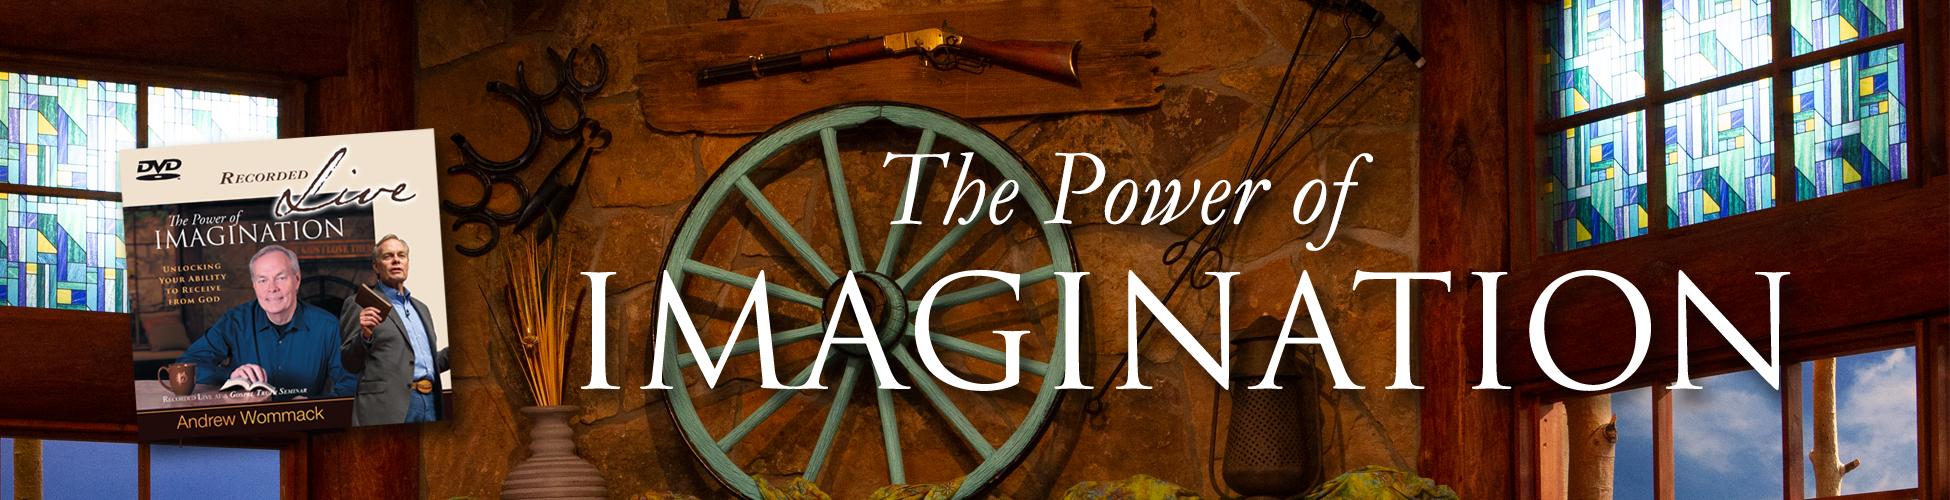 Power-of-Imagination-Website-Slider-1950x500_2